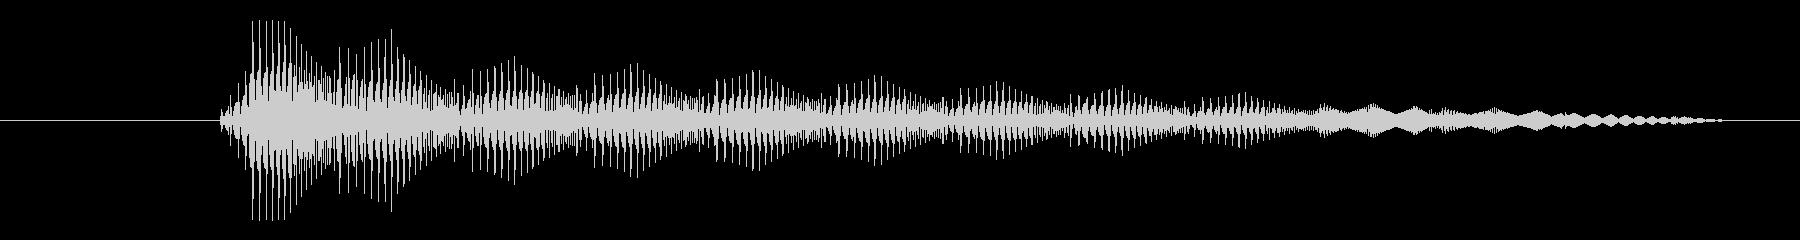 FX アーケードスーパージャンプ01の未再生の波形